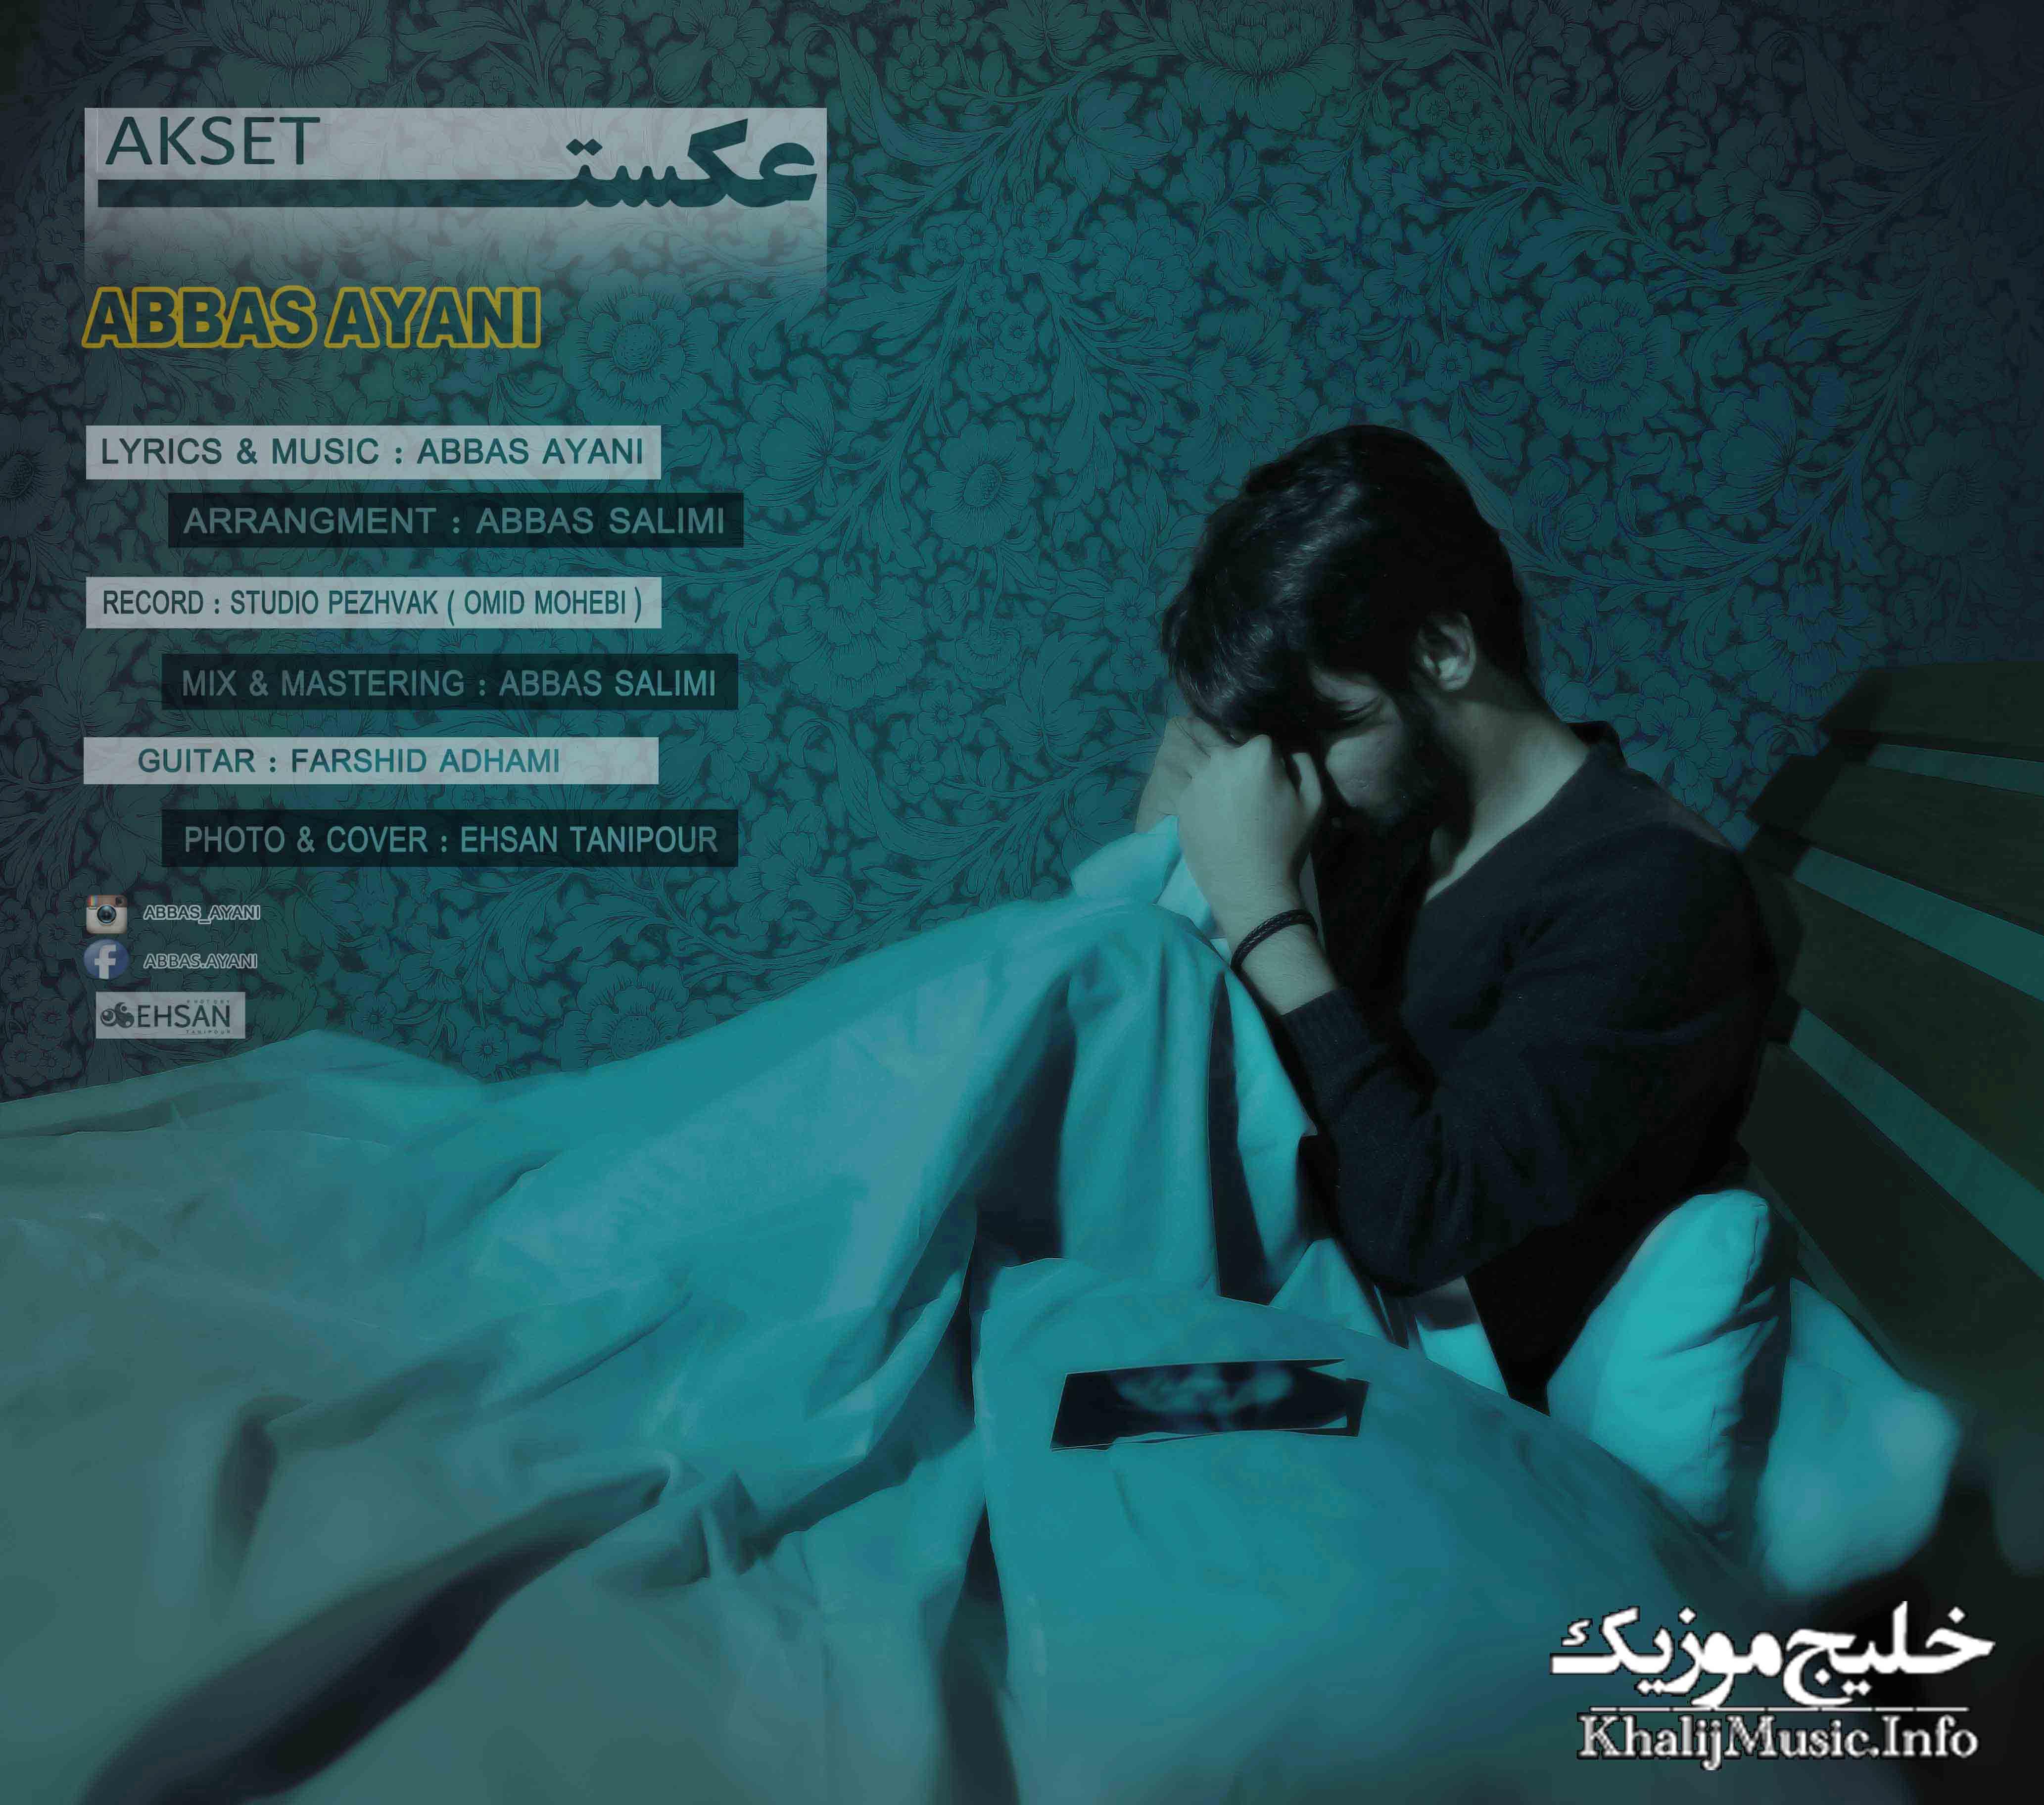 http://dl.khalijmusic.us/ax/Abbas_Ayani_Axet(Bandar-Abbasi).jpg